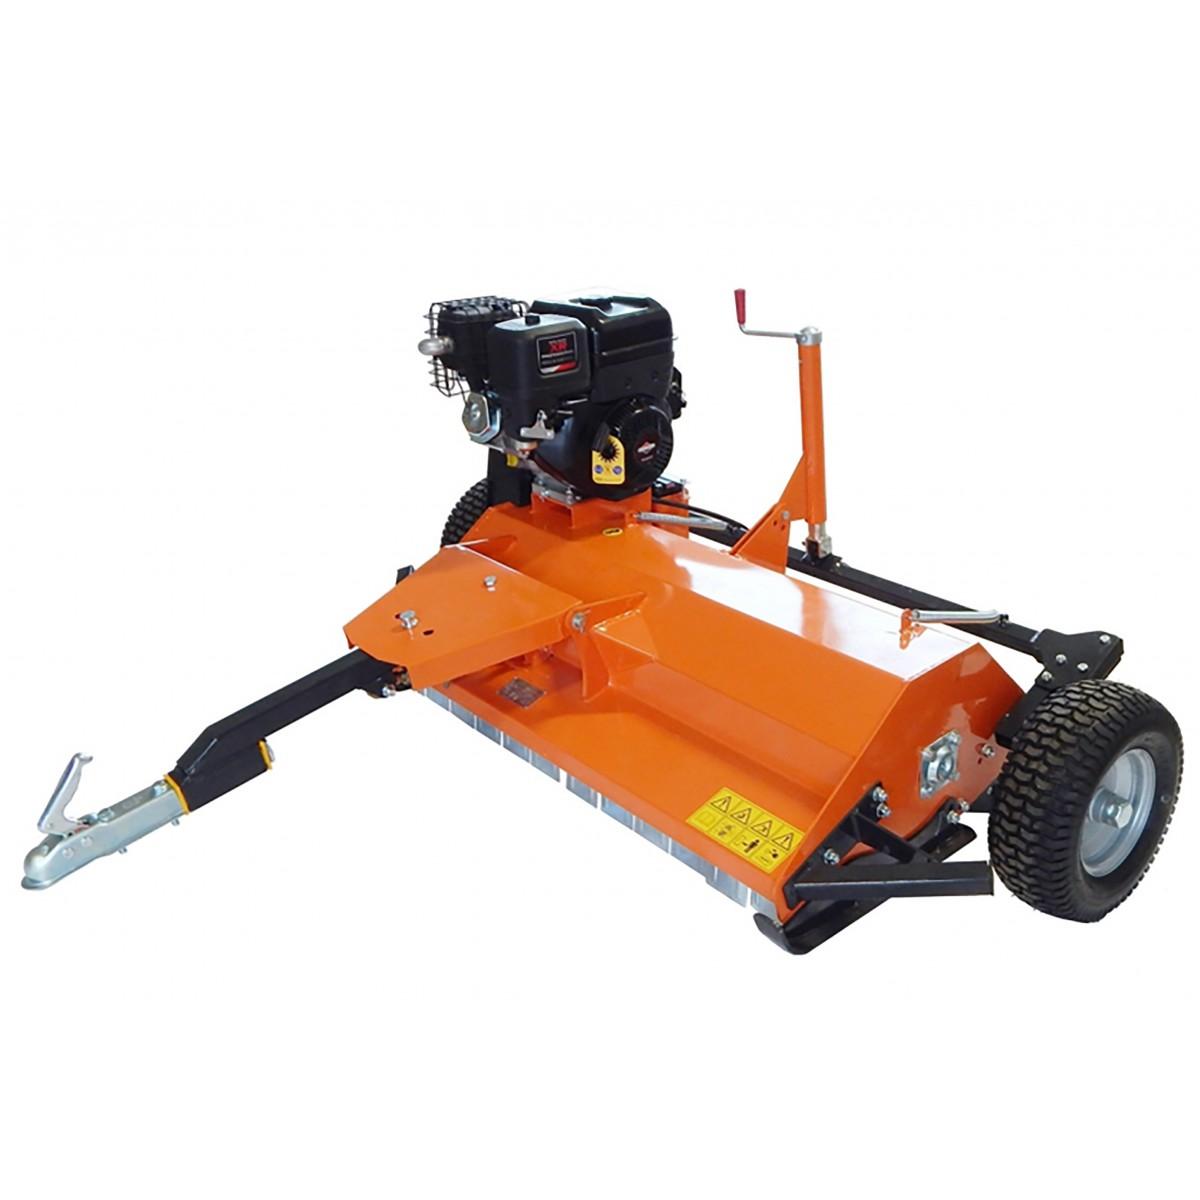 Flail mower ATV-AT120 B&S engine GEOGRASS